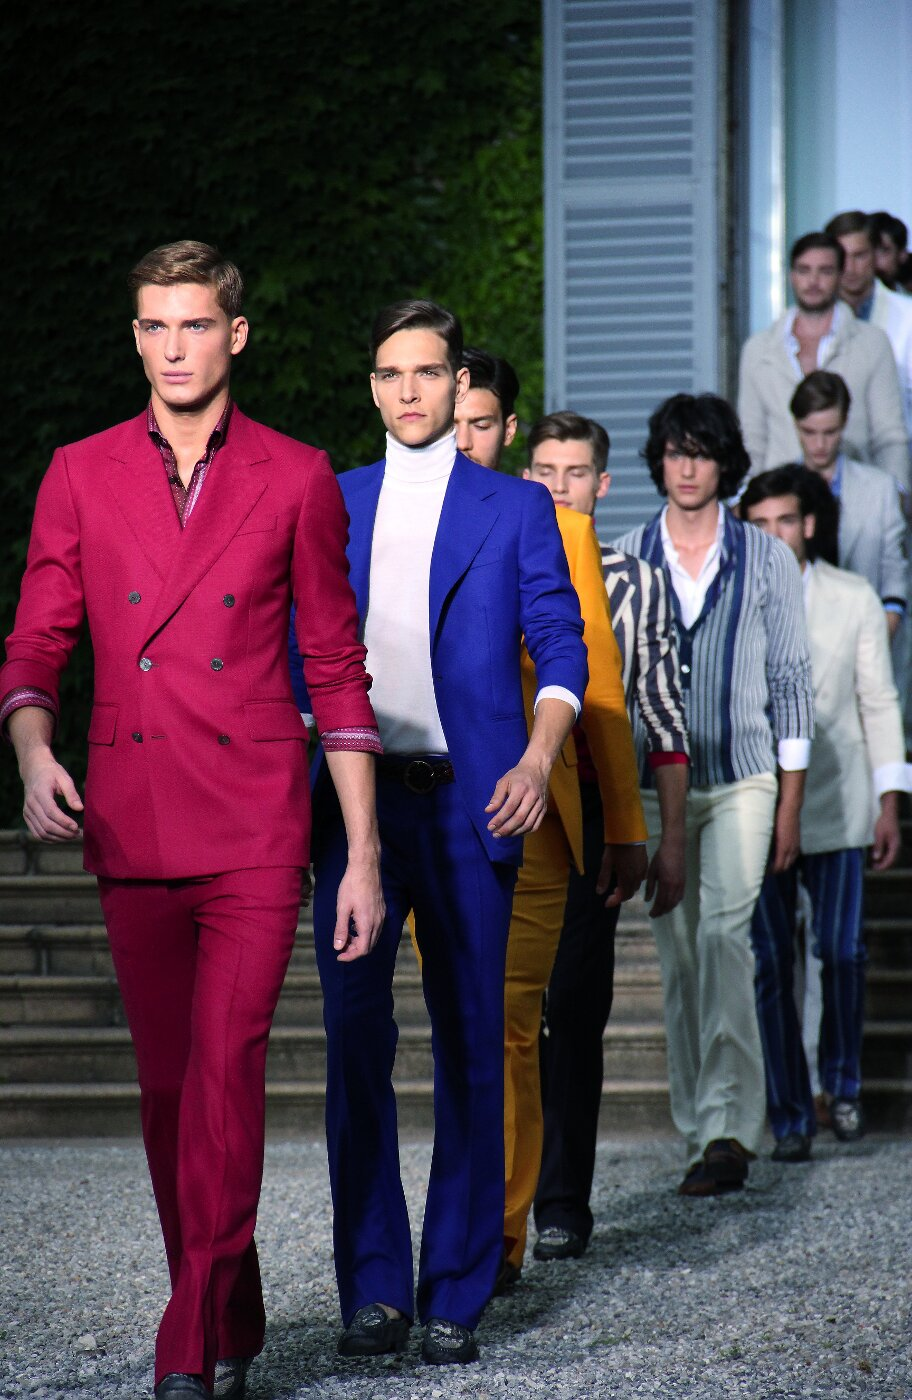 ss-roberto-cavalli-2012-ss-spring-summer-2012-milano-fashion-week-roberto-cavalli